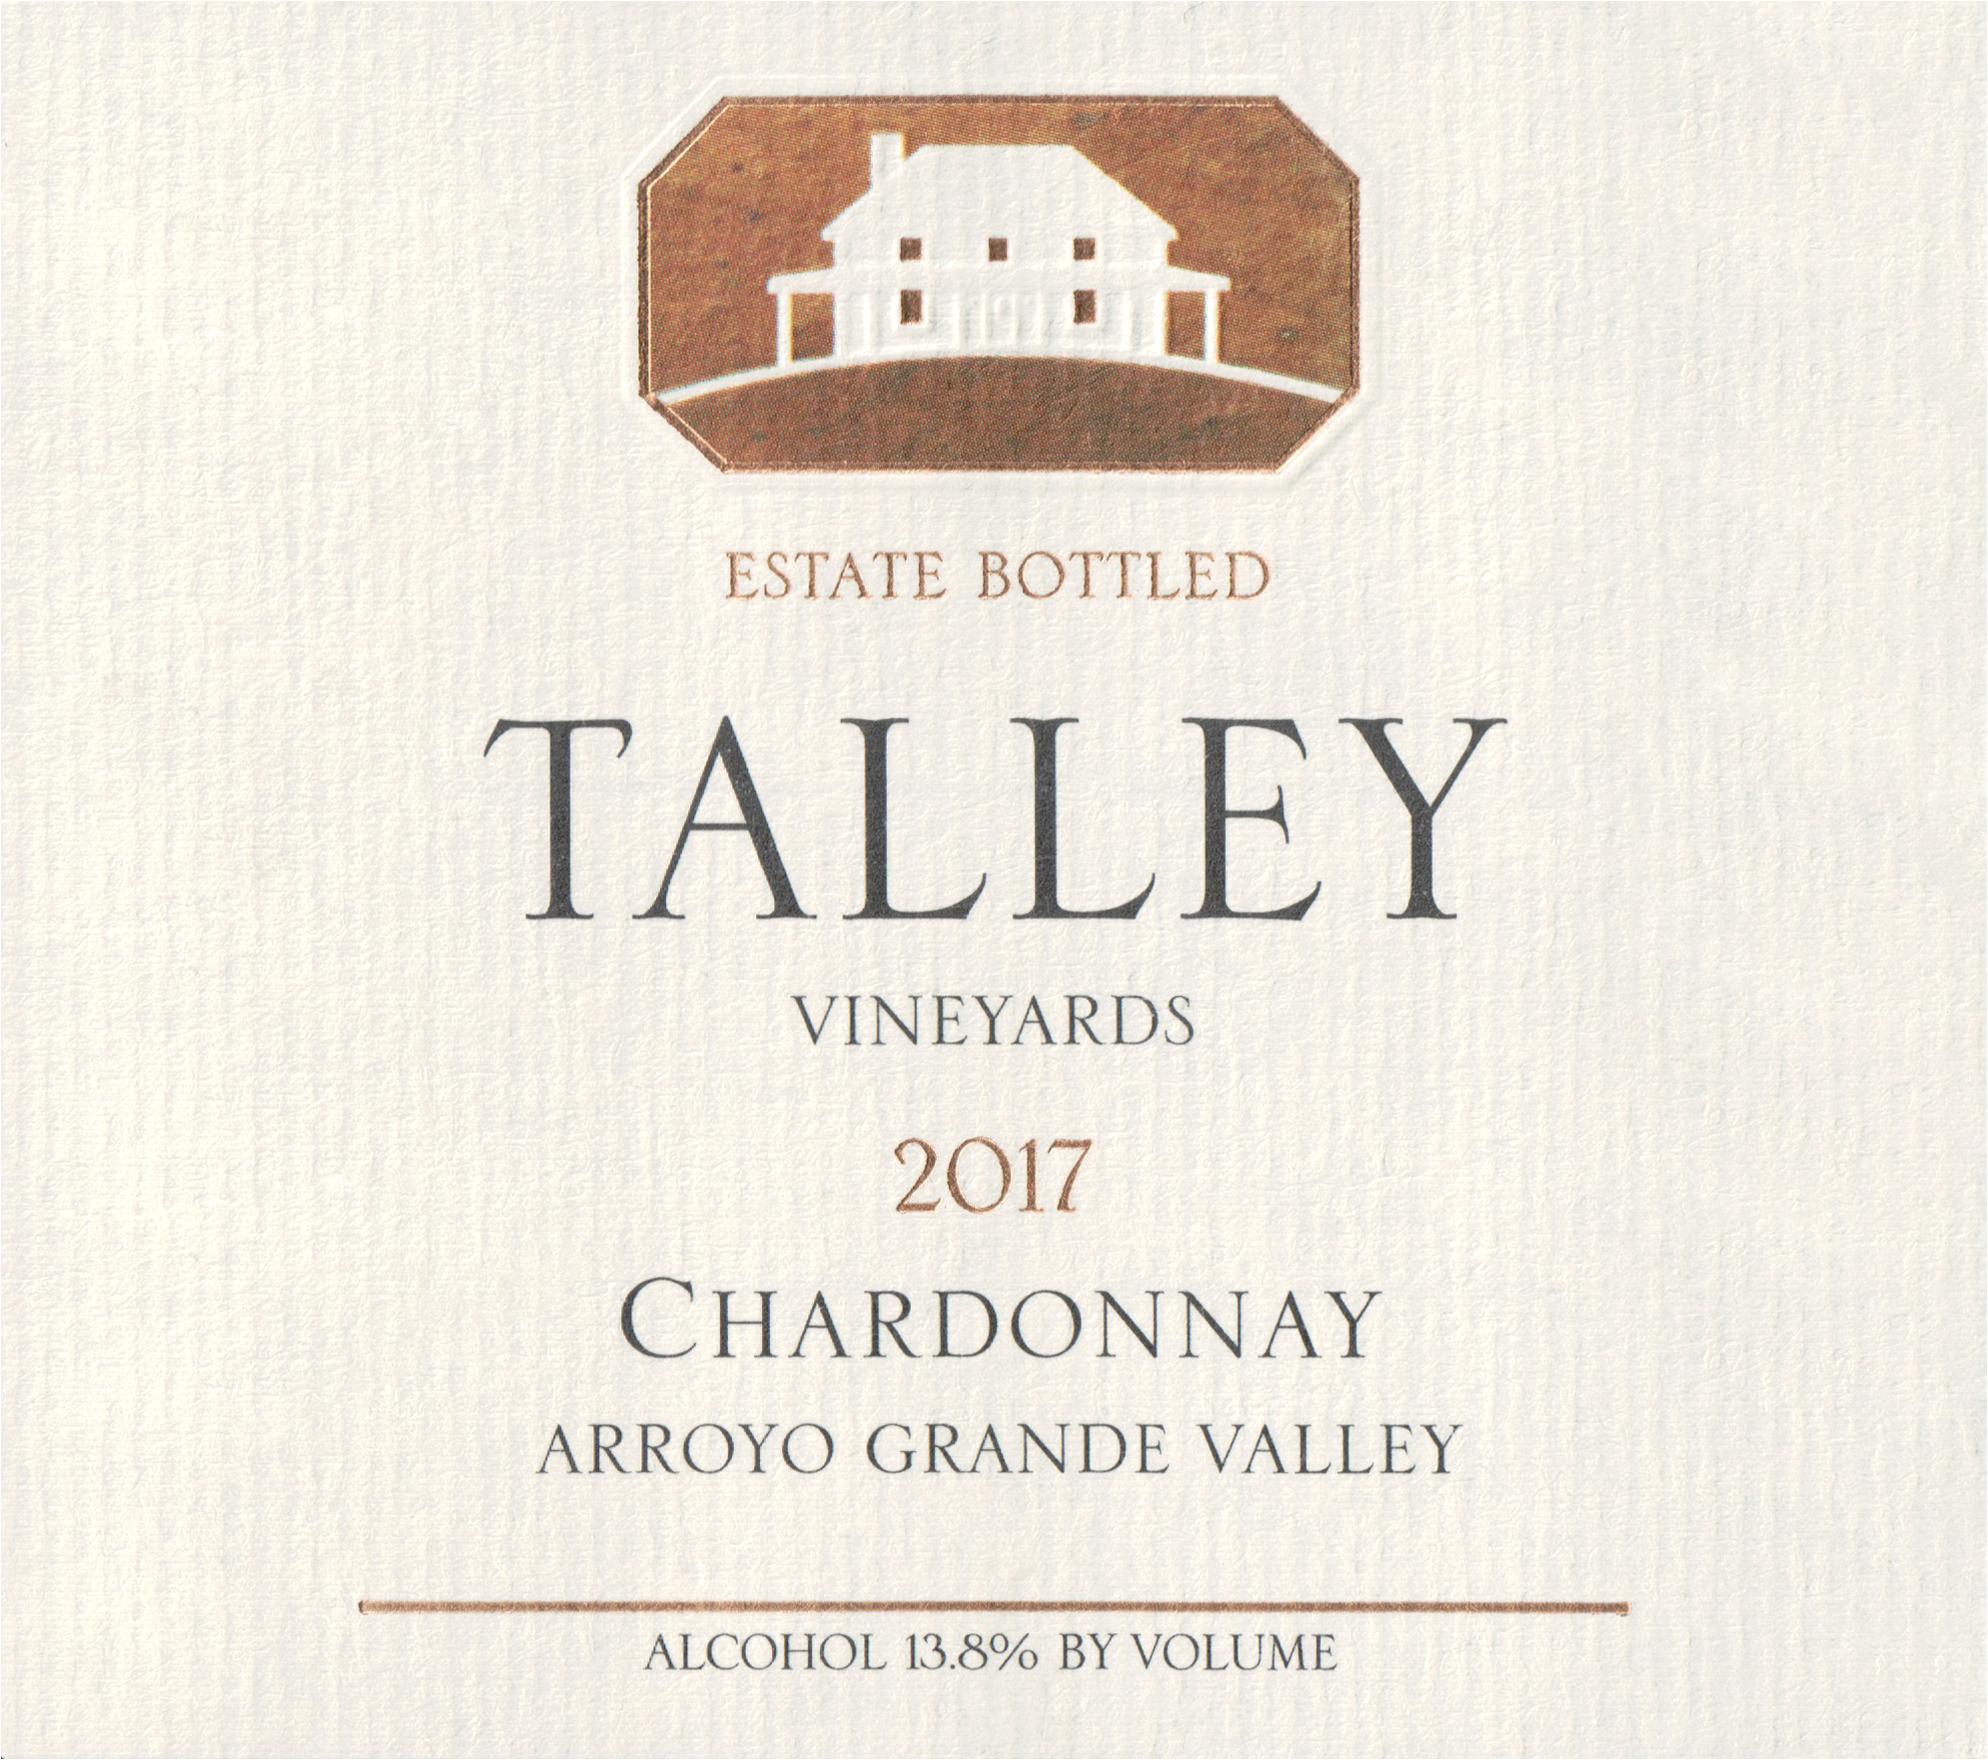 Talley Vineyards Estate Chardonnay Arroyo Grande 2017